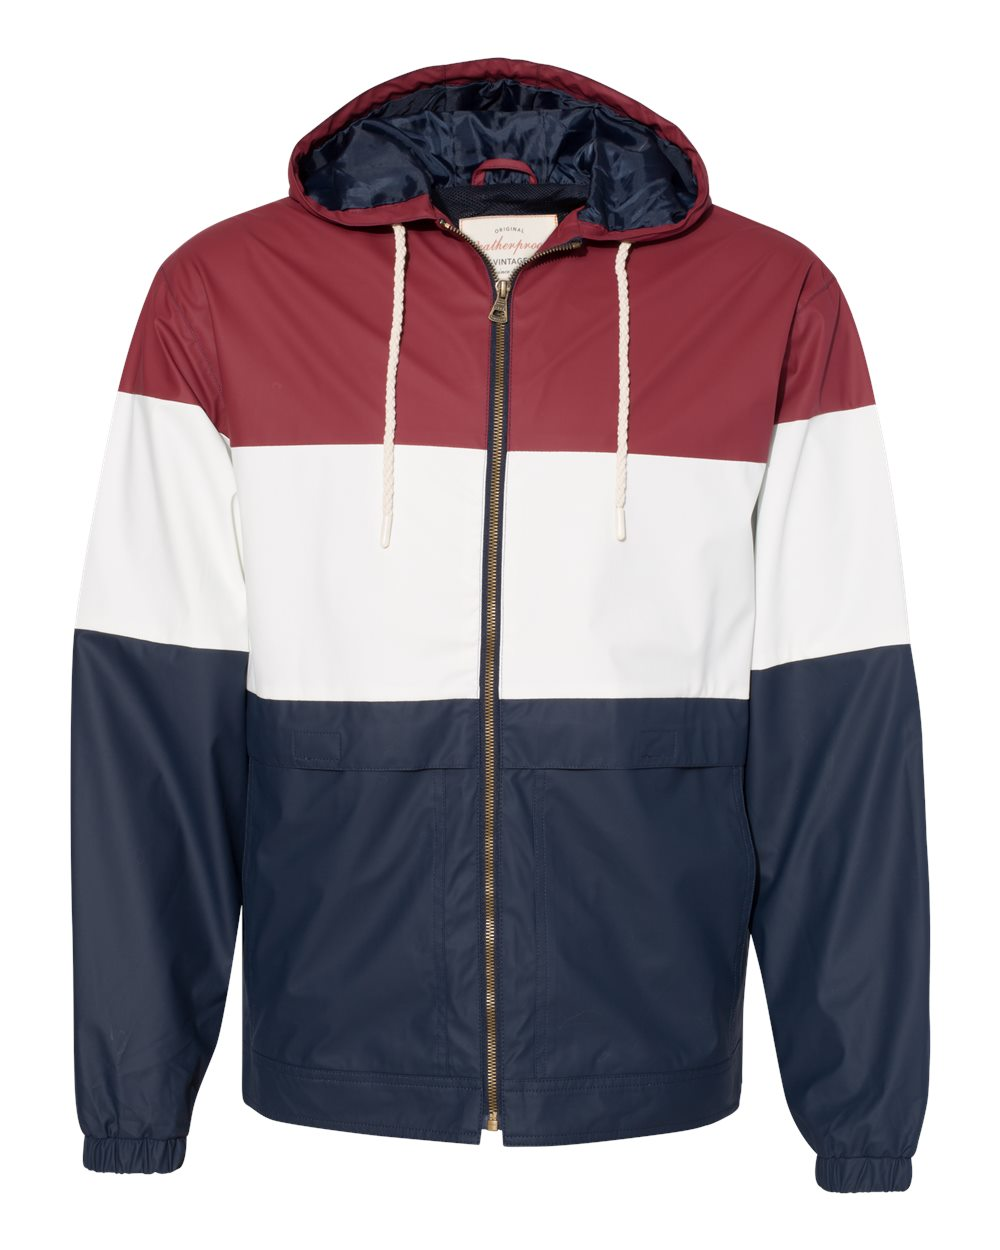 Weatherproof 20601 - Vintage Colorblocked Hooded Rain Jacket